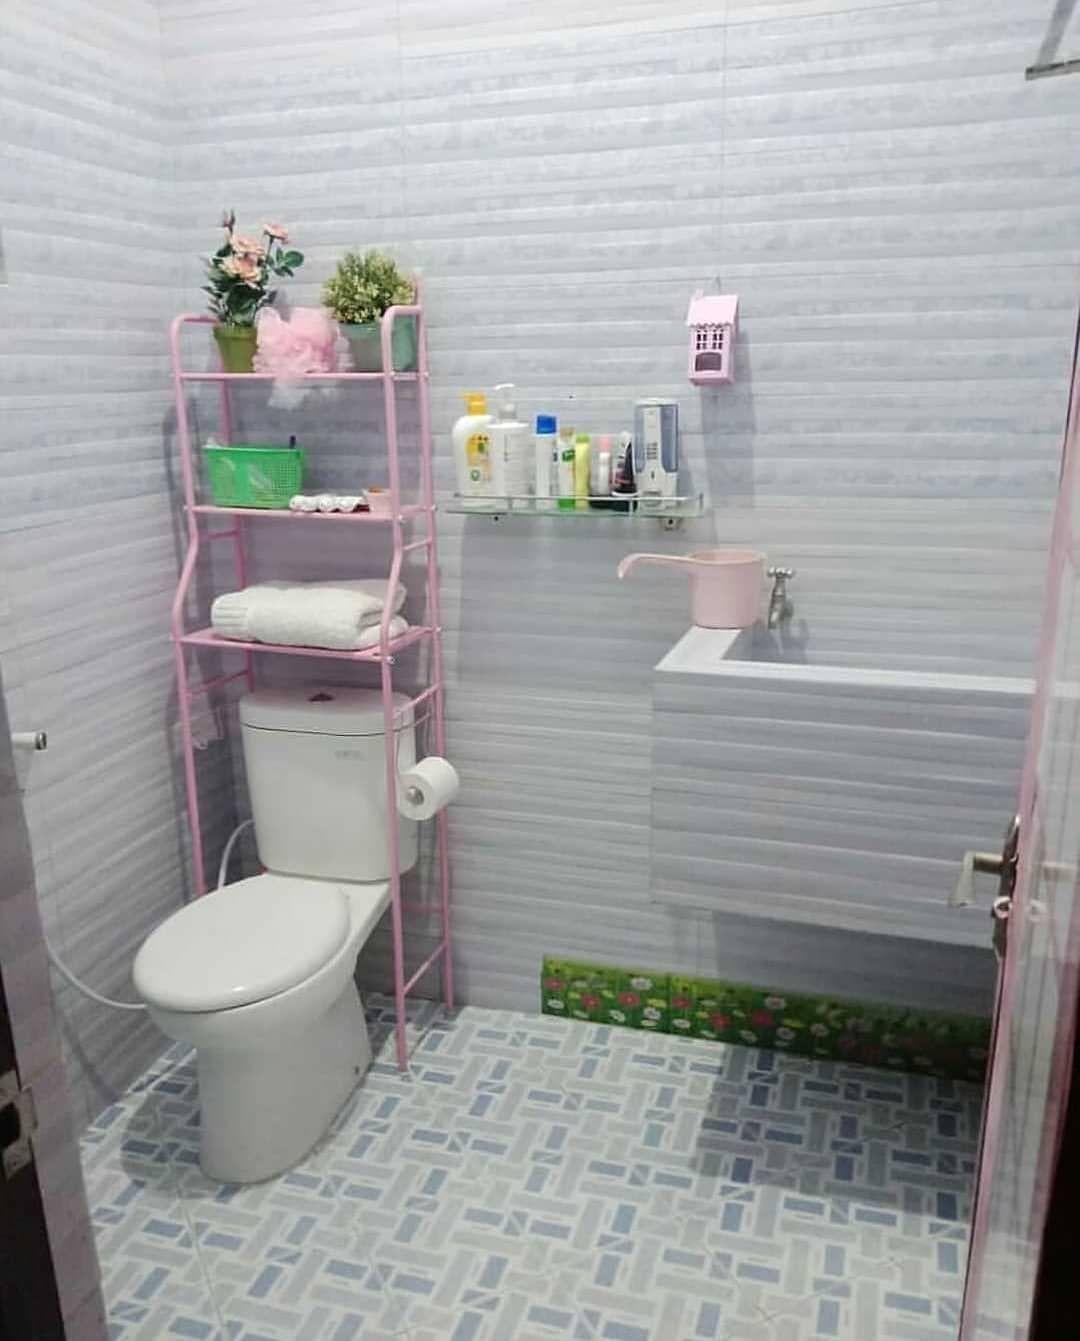 [New] The 10 All-Time Best Home Decor (Right Now) - On A Budget by Jennie Cross -  Ide design rumah masa kini . . Cantik menginspirasi  . . So beautiful  . . @erlina_ahmad78 . . #rumah #rumahcantik #rumahindah #rumahidaman #rumahshabby #rumahshabbychic #interiordesign #rumahku #rumahmewah #shabbychic #designrumah #iderumah #iderumahunik #homedecor #homegallery #rumahimpian #rumahunik #designruang #tataruang #designrumahminimalis #designruang #homedecorlover #rumahidaman #rumahminimalis #tamanind